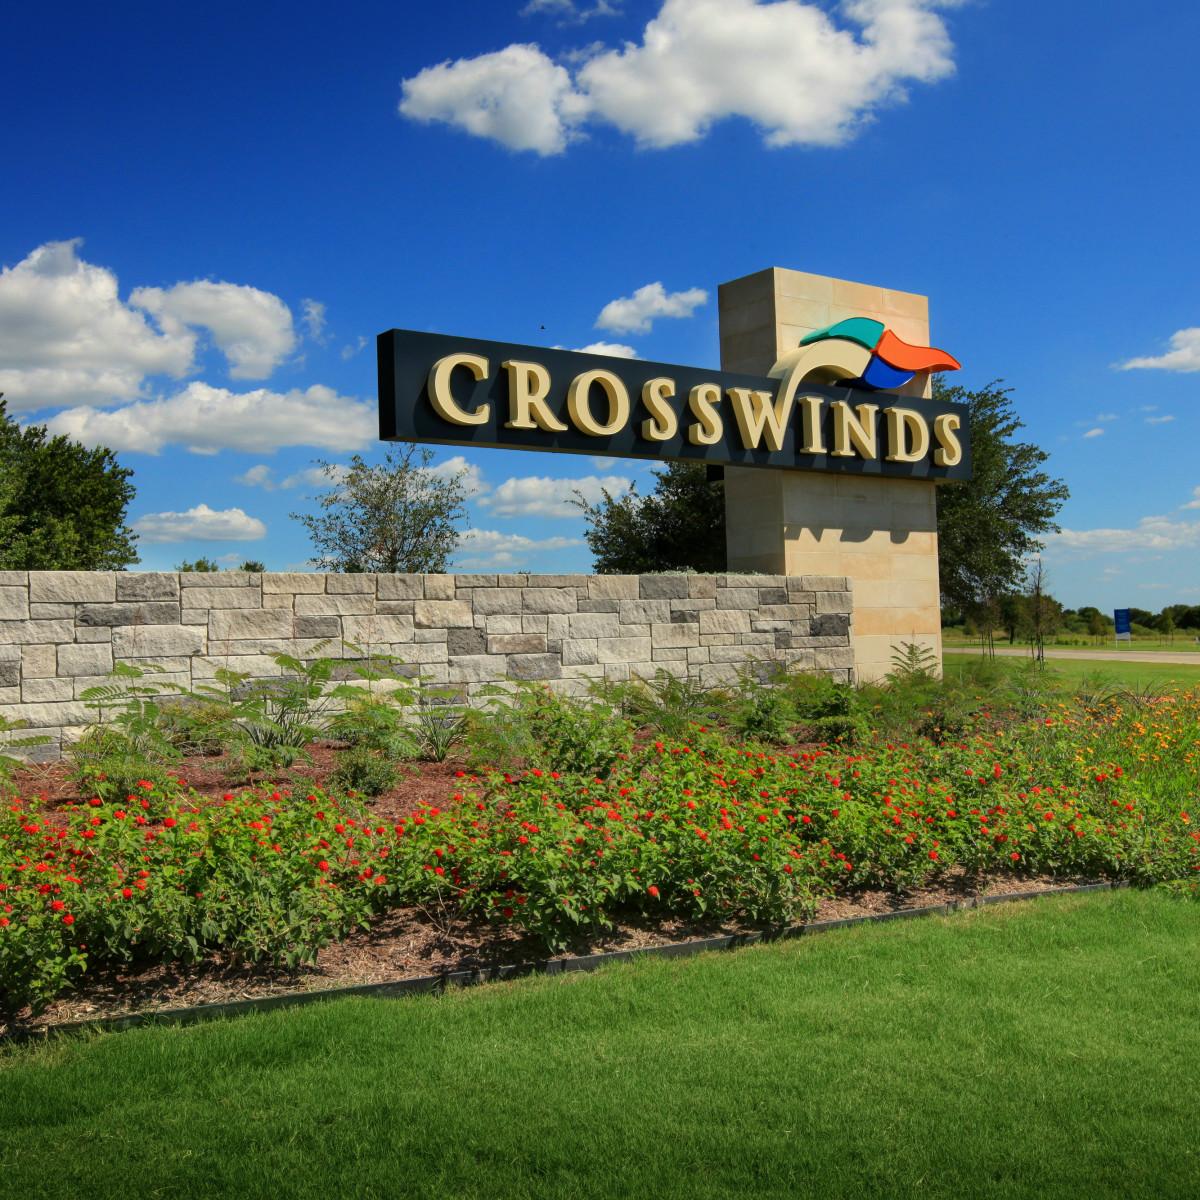 Crosswinds sign